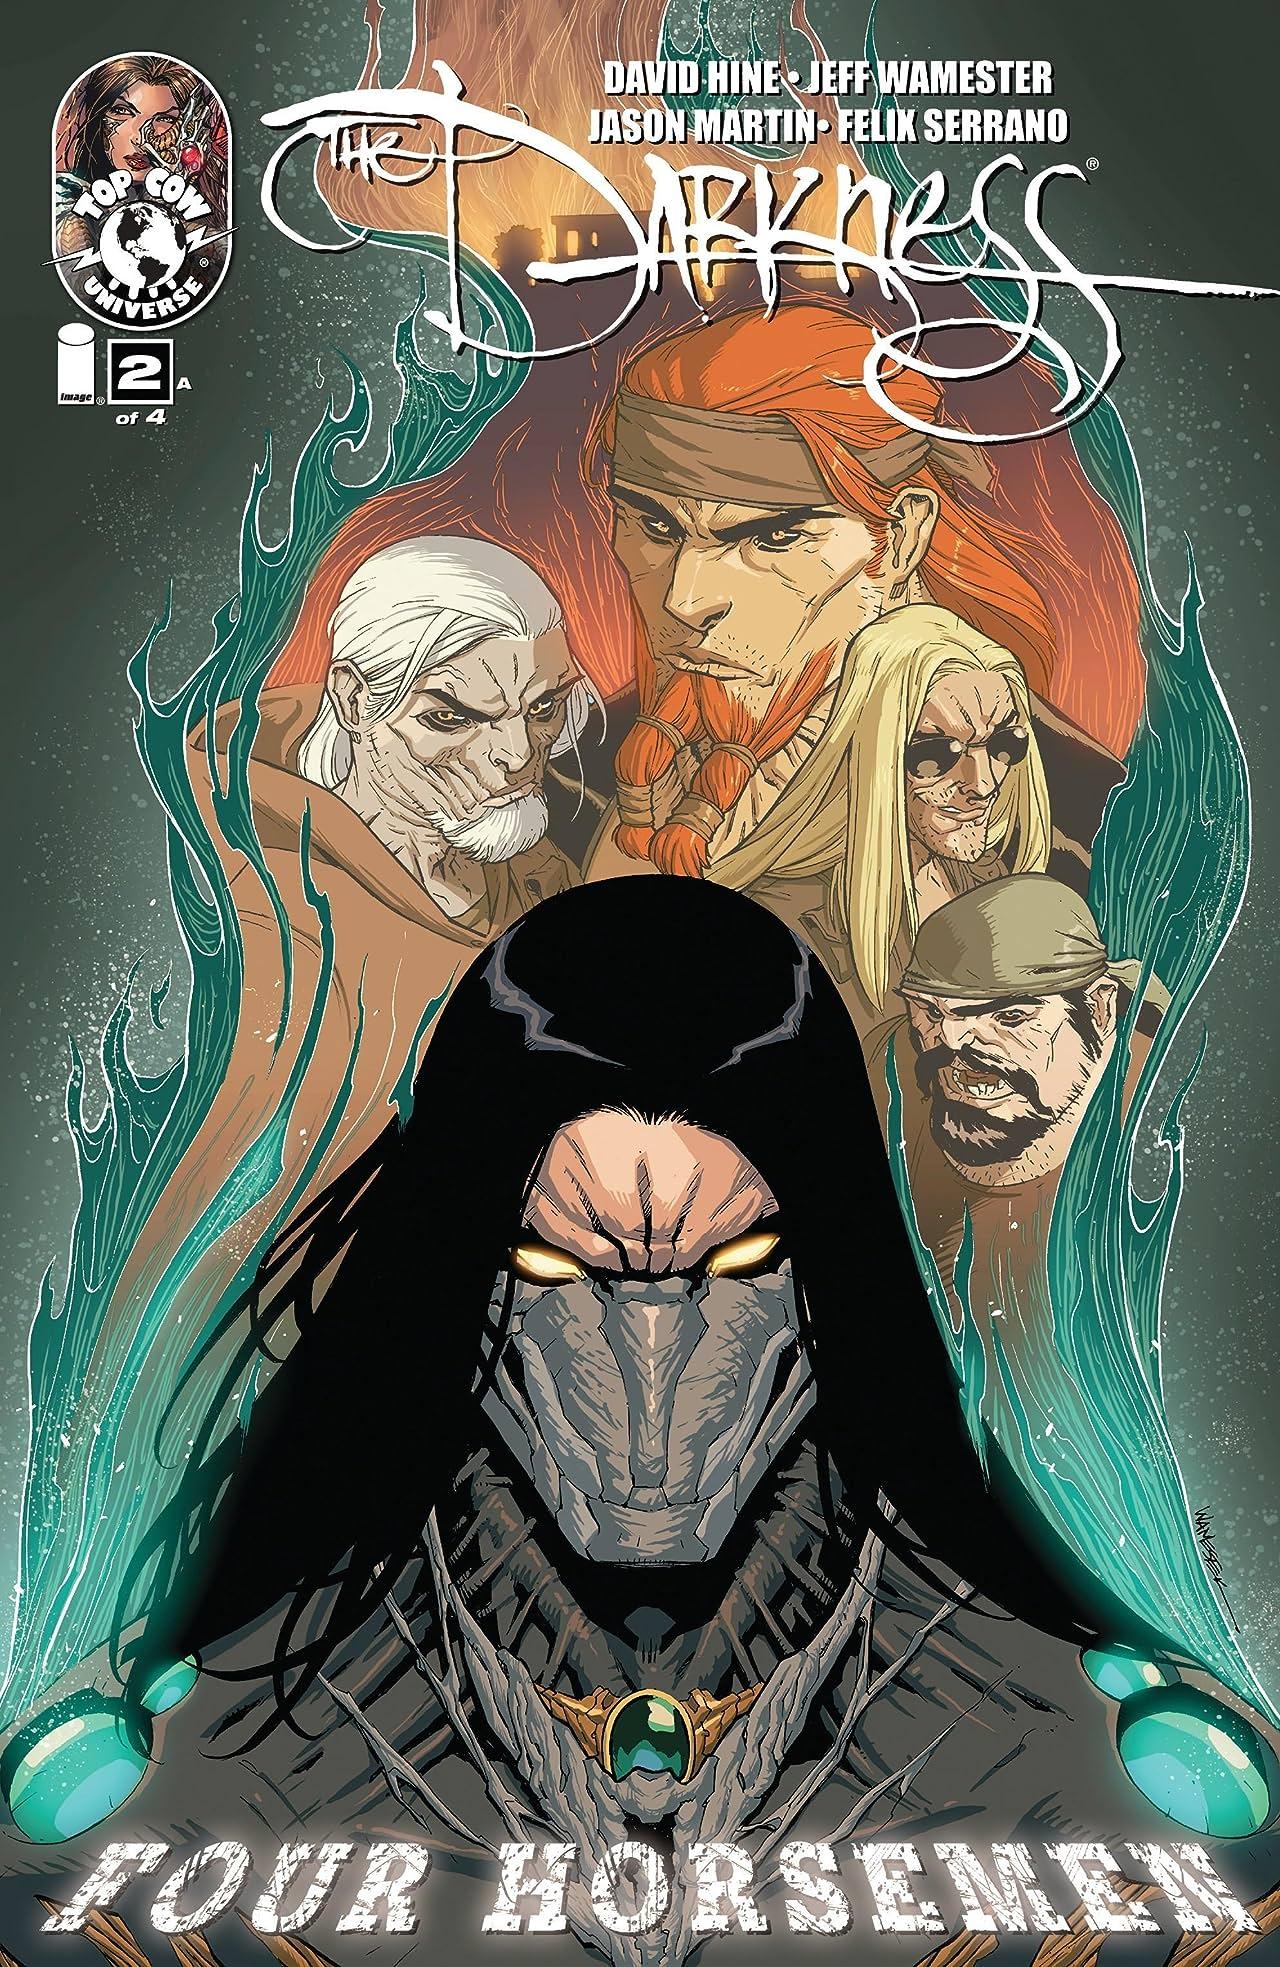 The Darkness: Four Horsemen #2 (of 4)